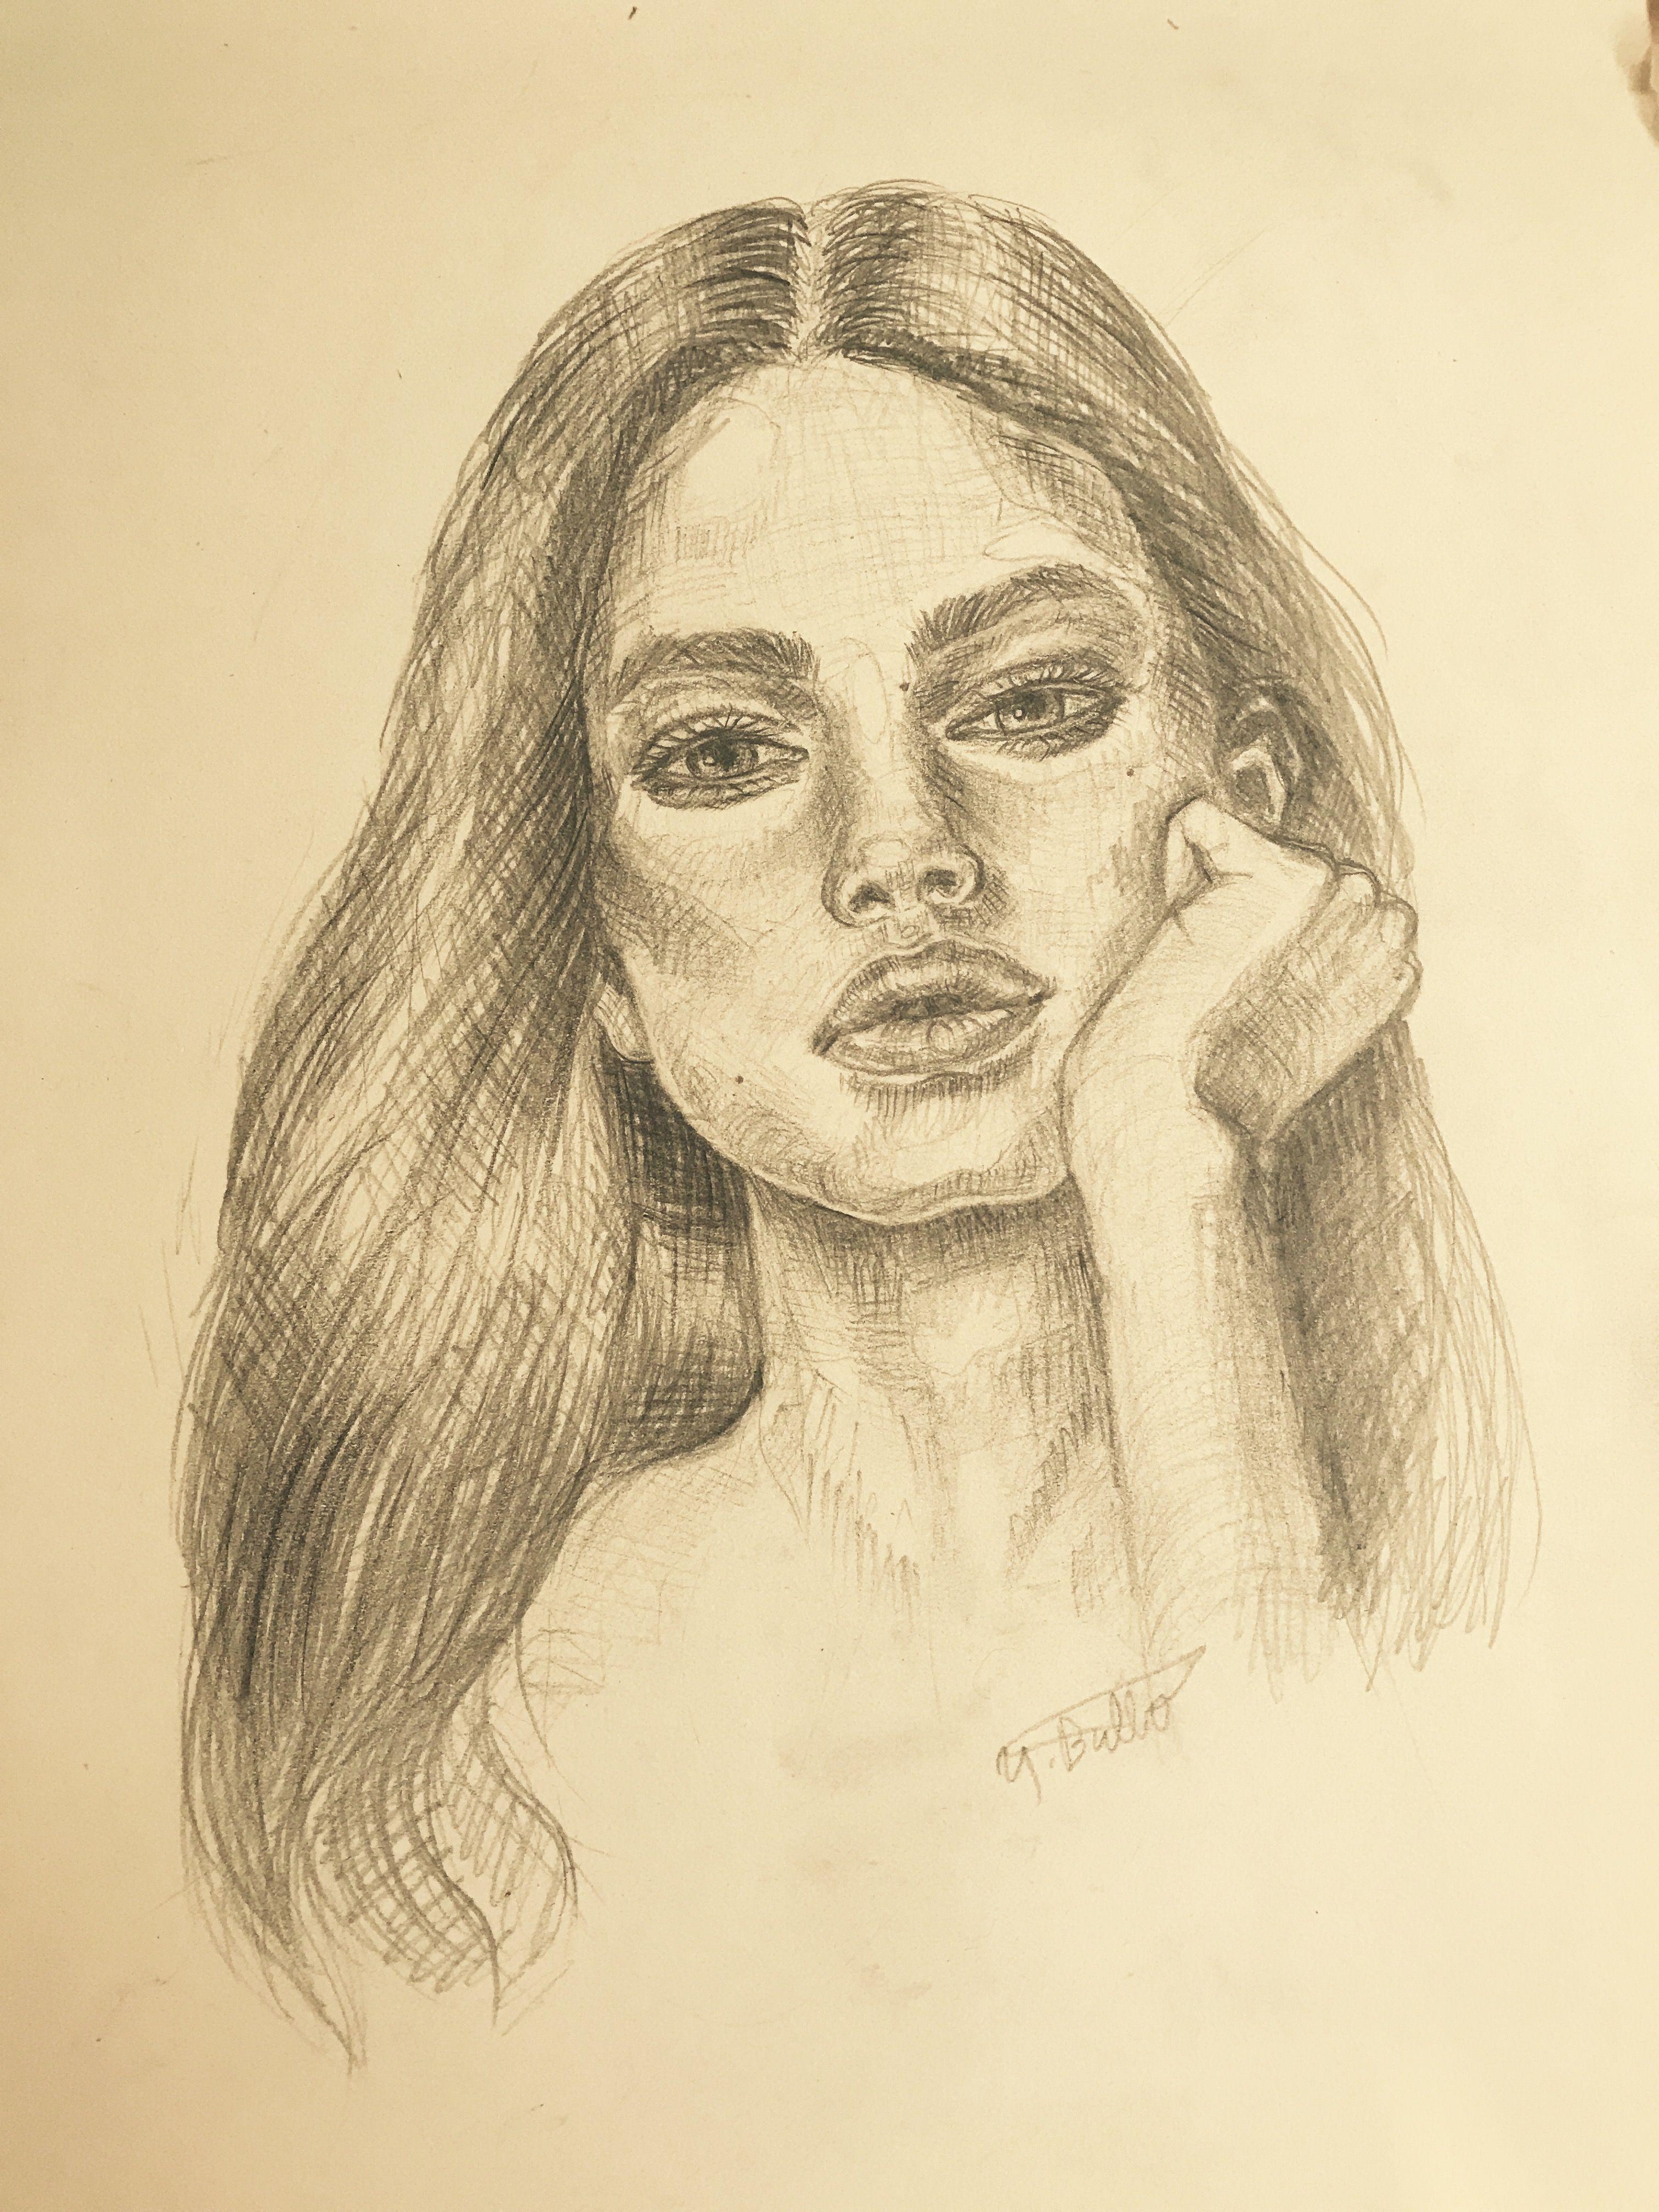 Sketch pencil drawing artwork by yasmine bulbol artportraitdrawing pencildrawingblackandwhiteartistsketchyasminebulbol